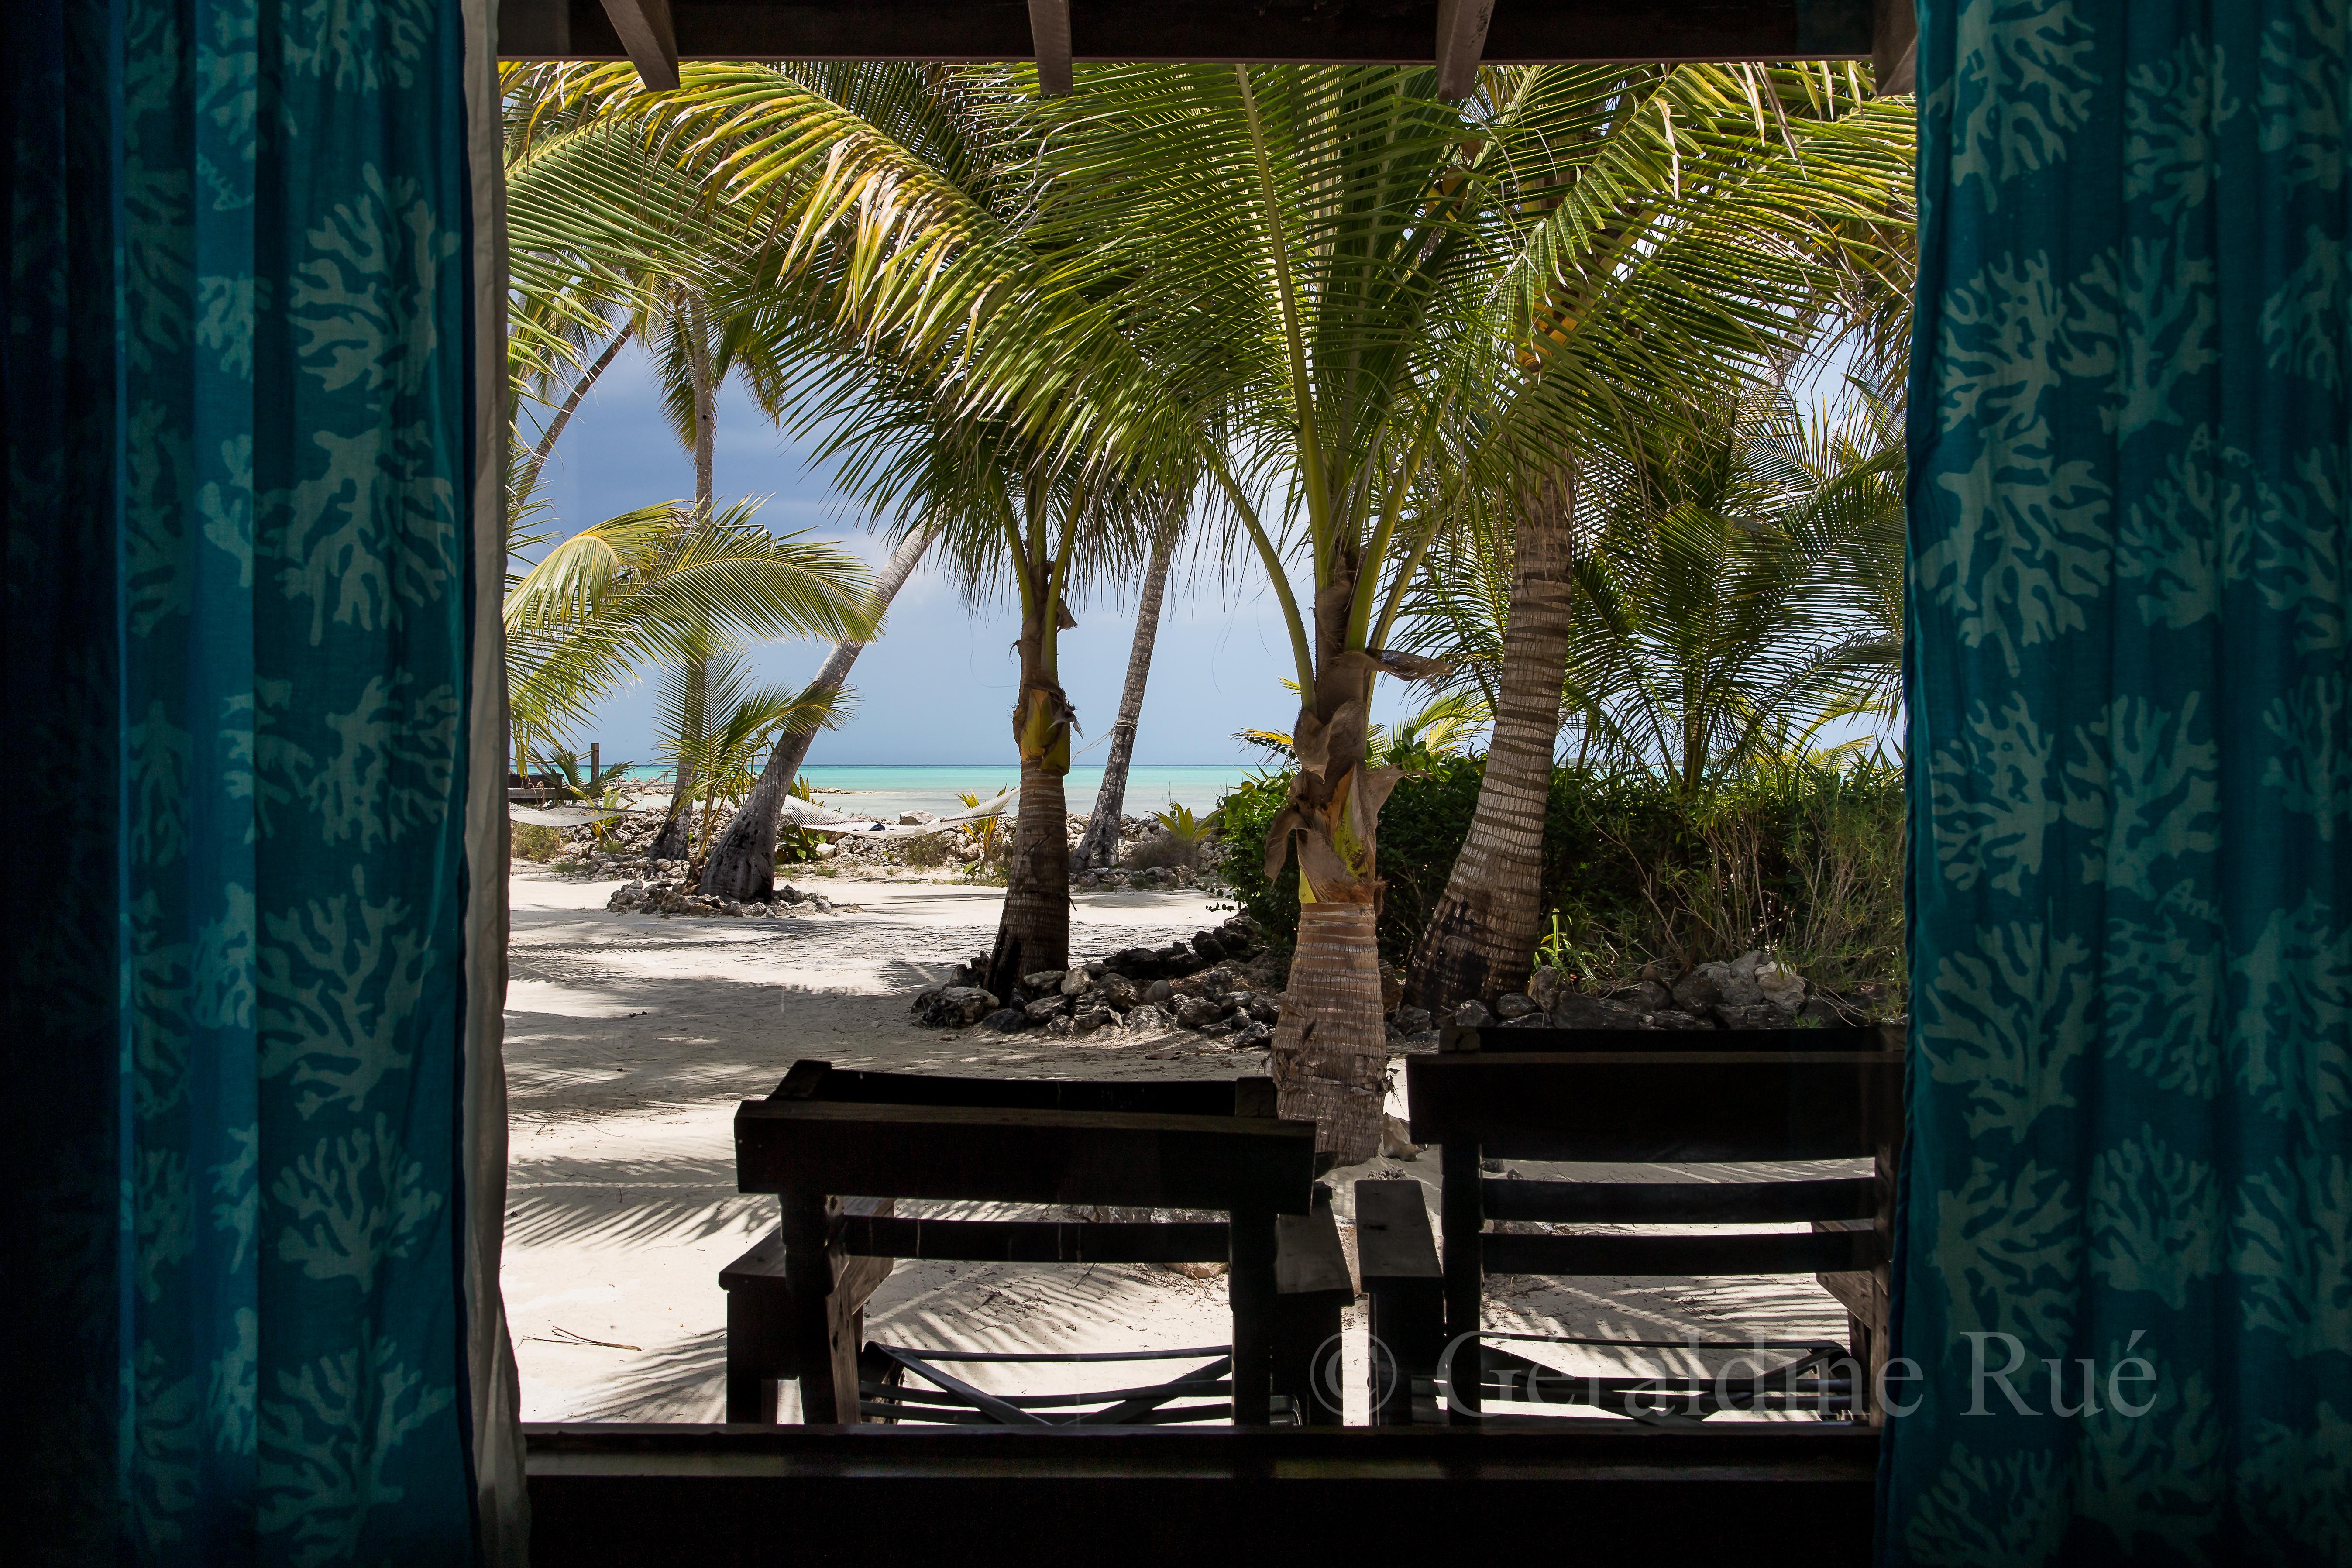 Bahamas 20162803© Géraldine Rué